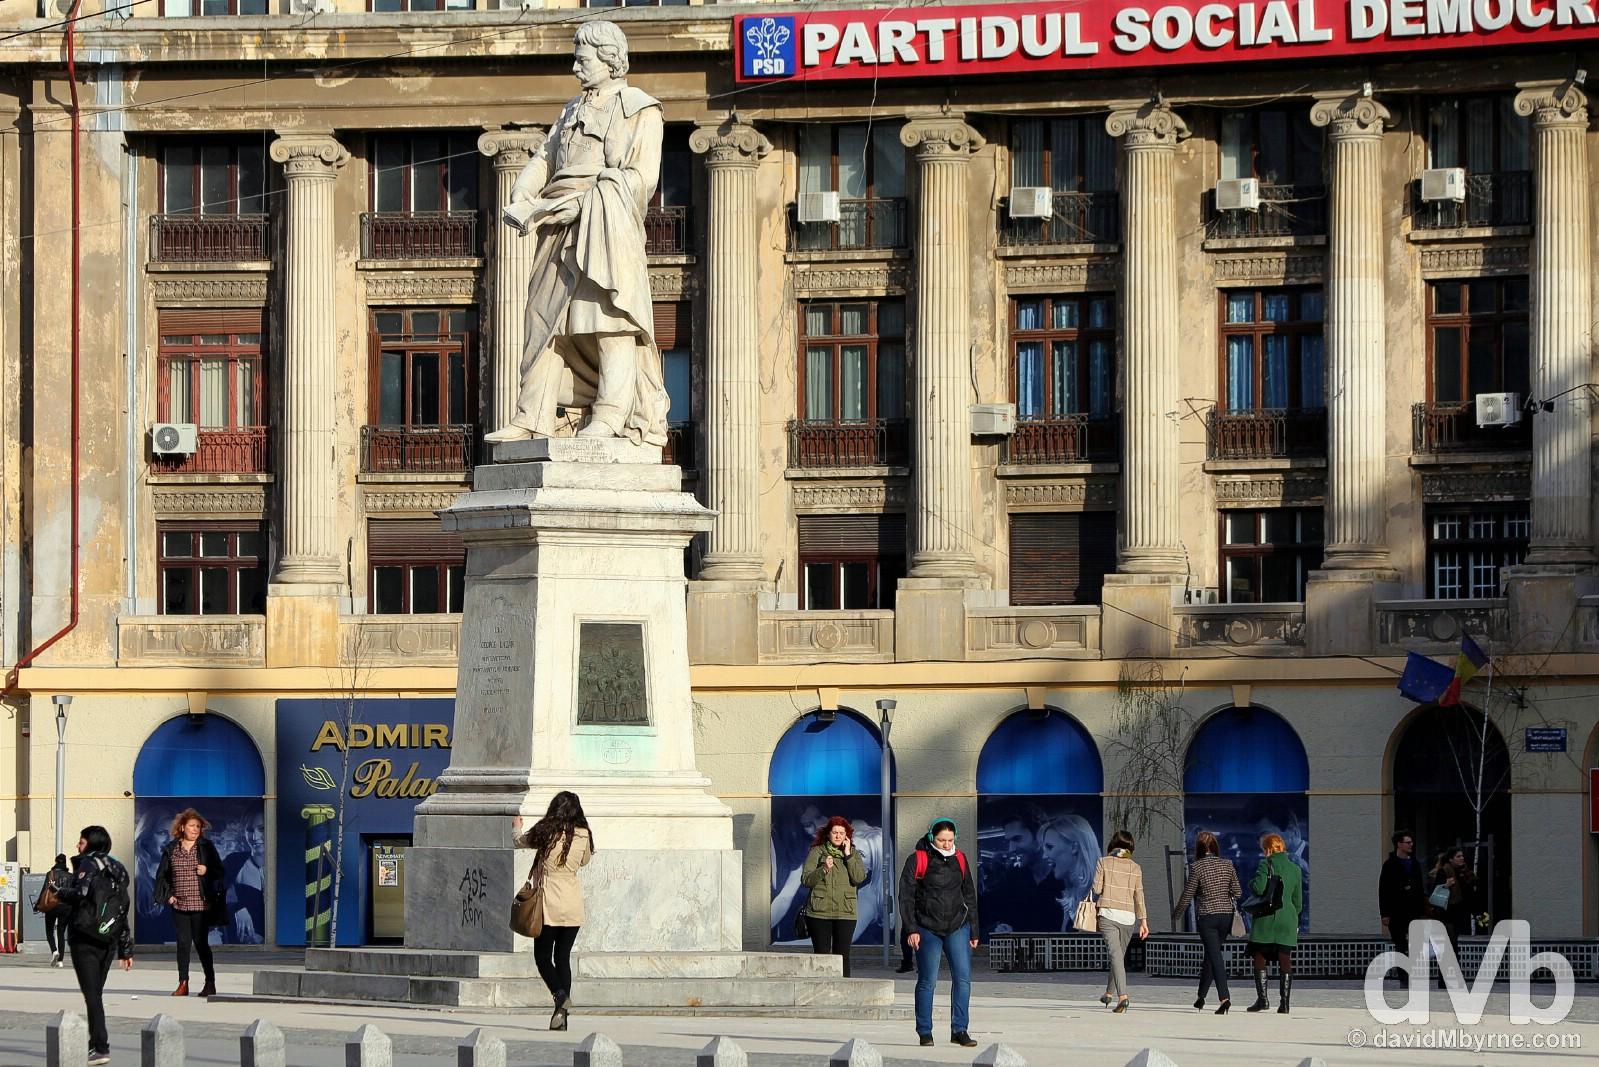 Piata Universitatii (University Square), Bucharest, Romania. April 1, 2015.